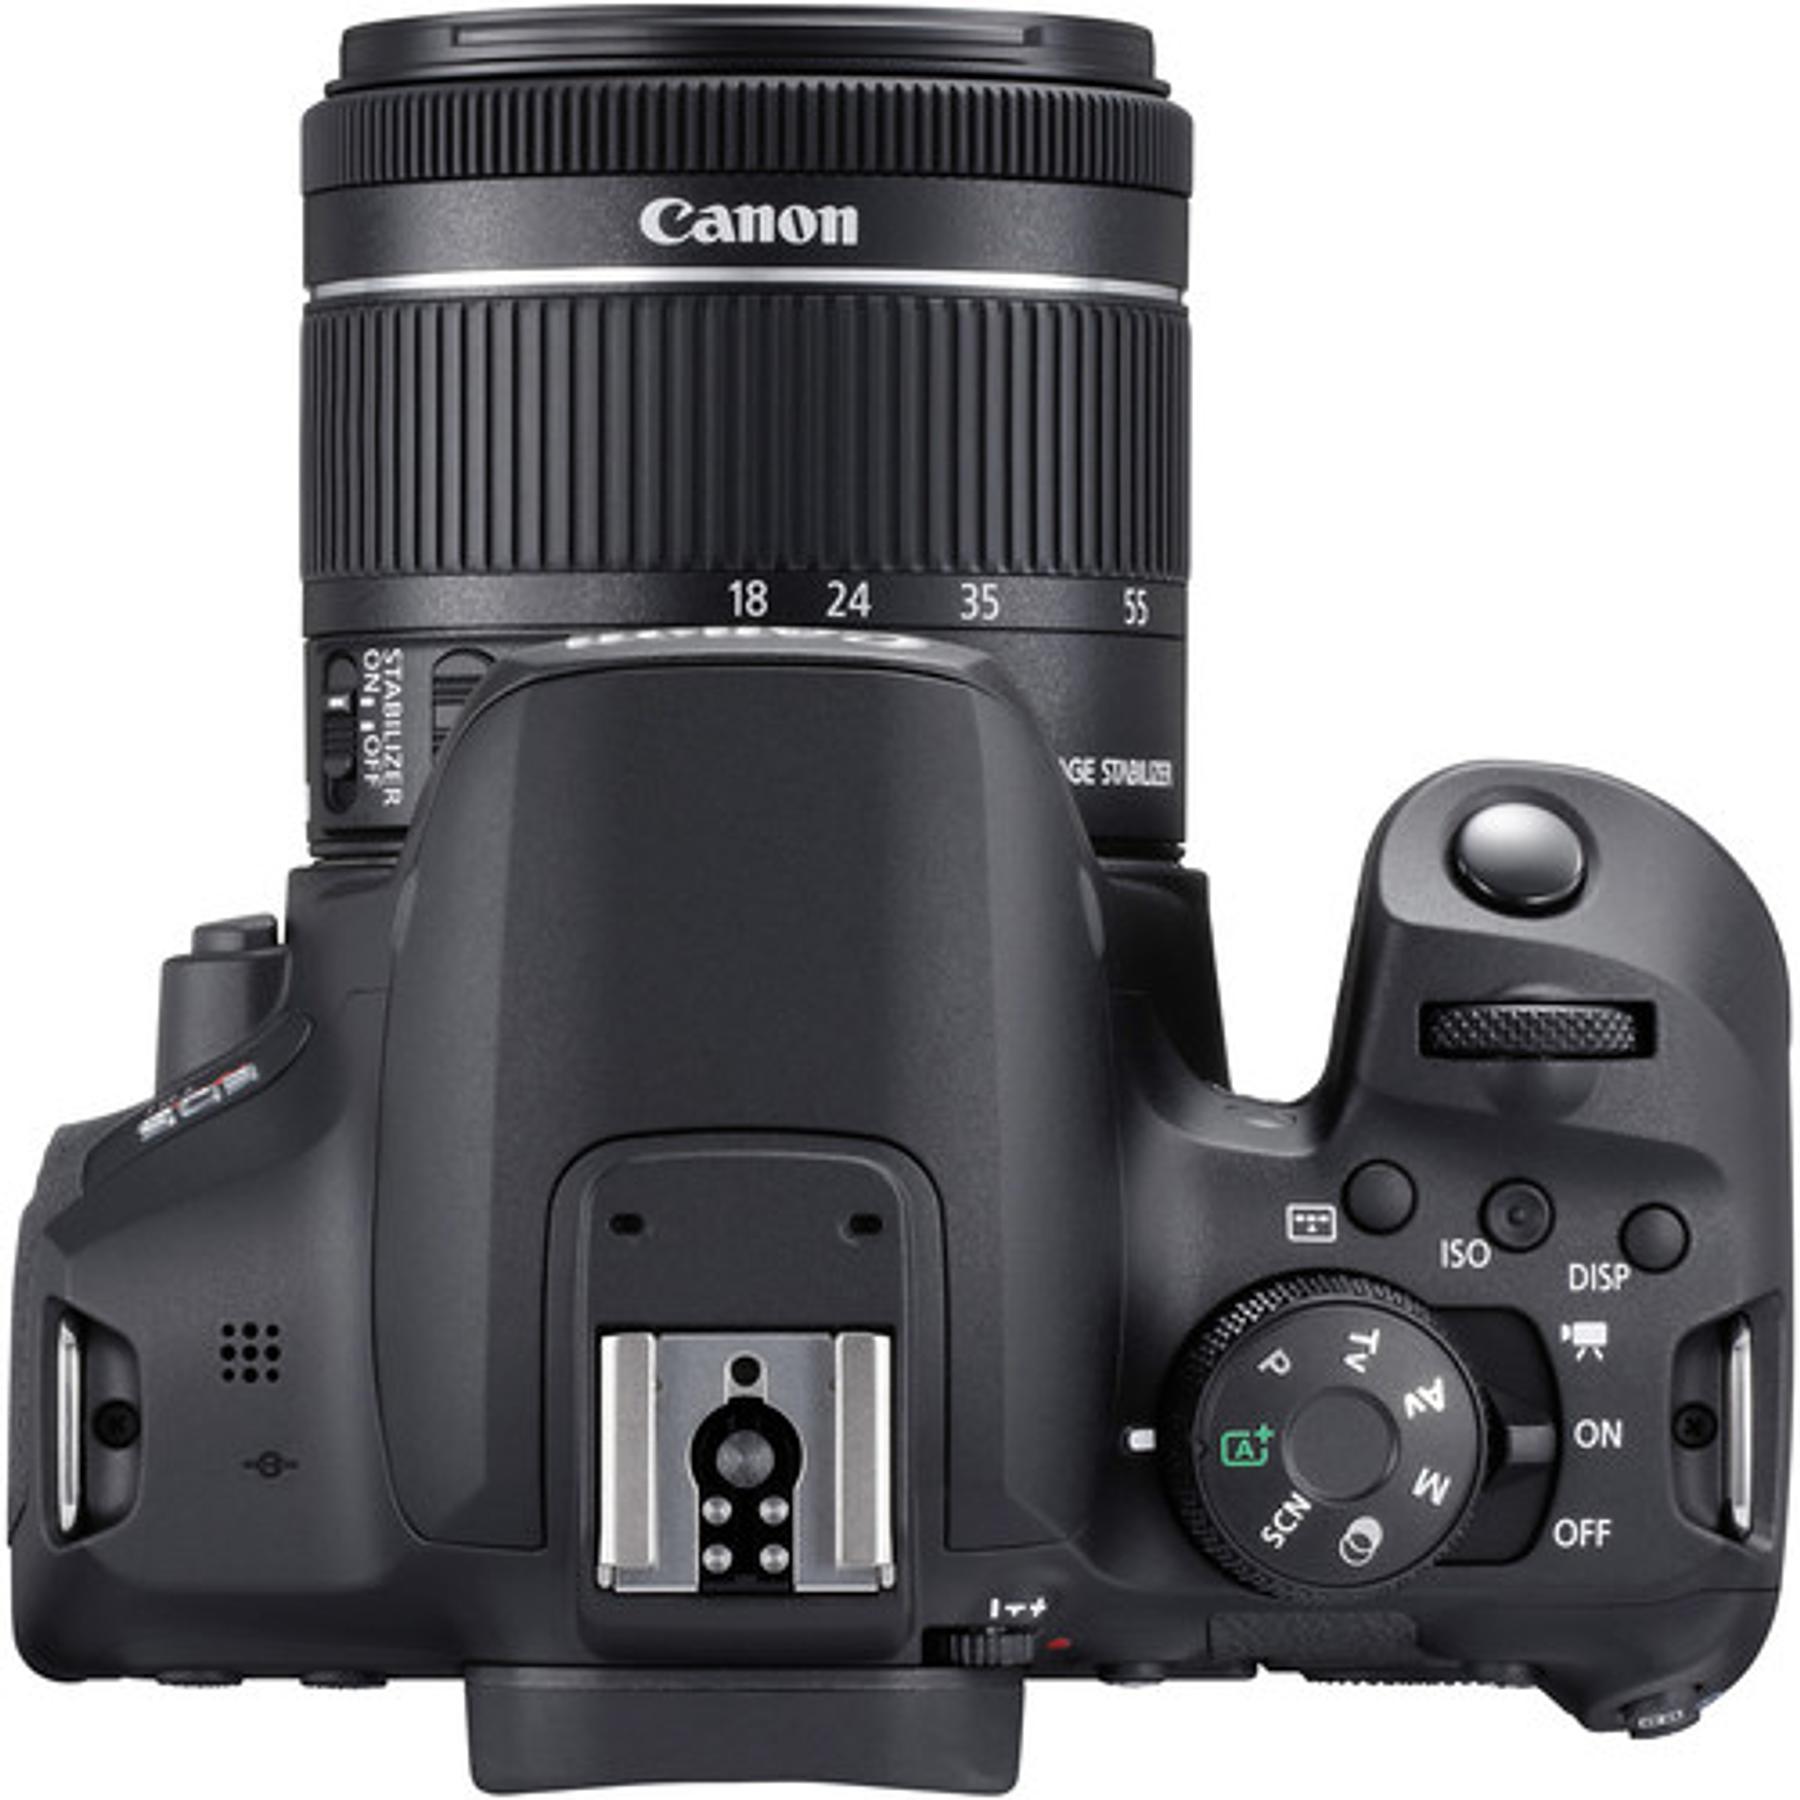 Cámara Canon EOS Rebel T8i DSLR con lente de 18-55 mm f/4-5,6 IS STM.